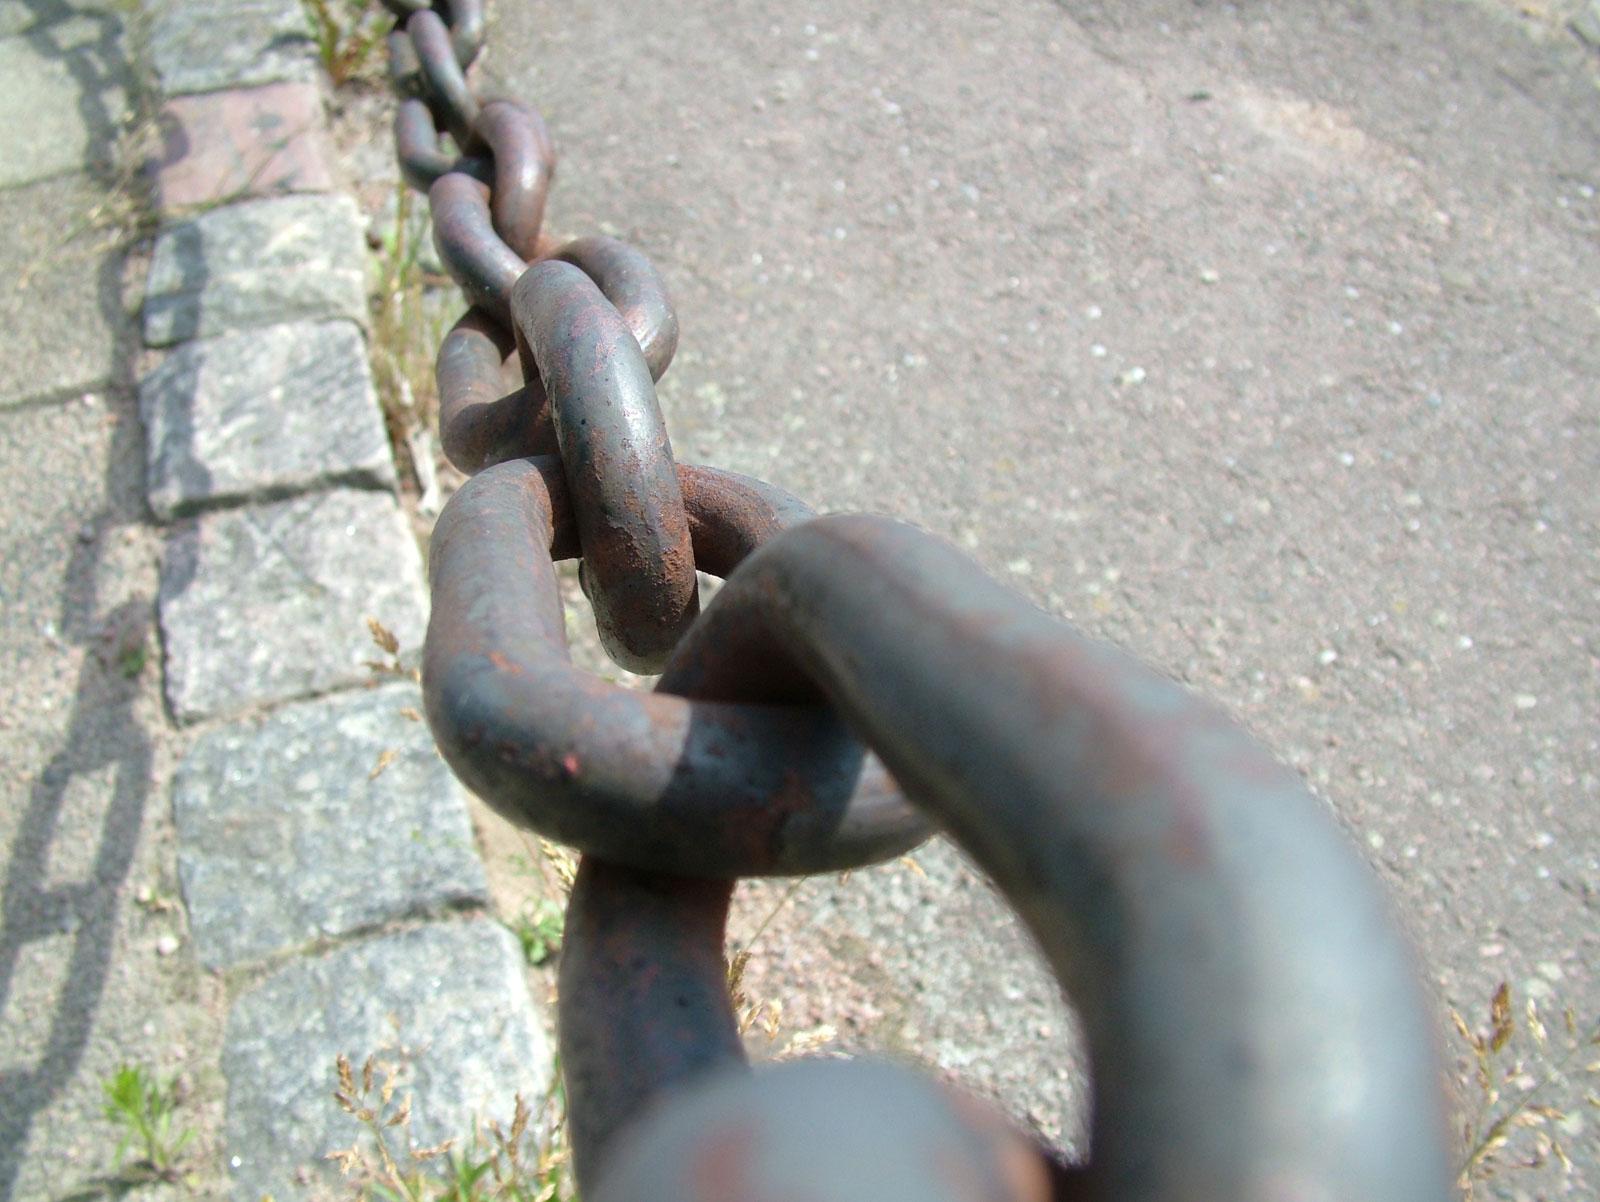 Chain, Hang, Link, Metallic, HQ Photo